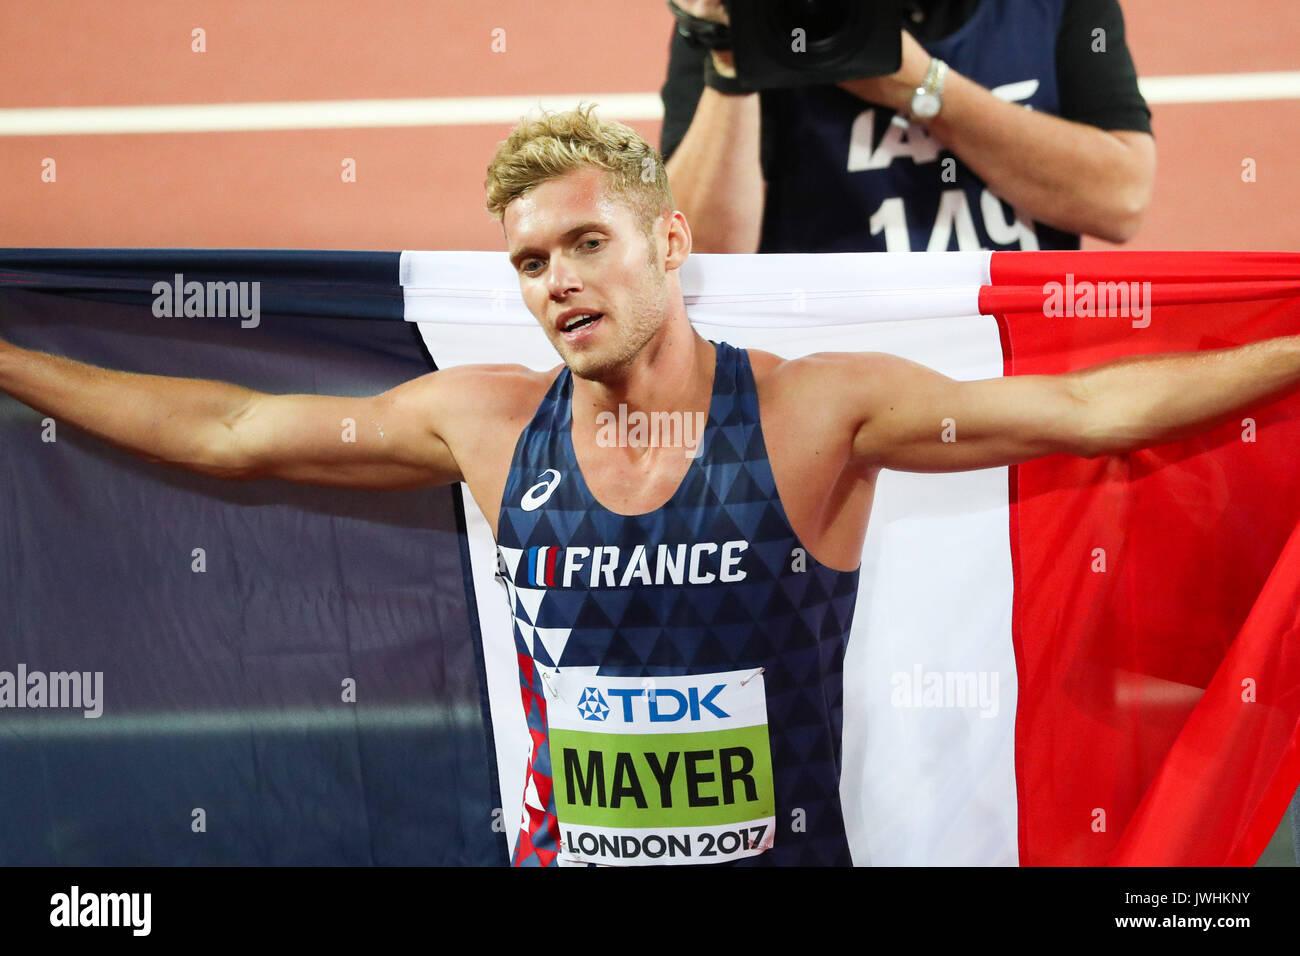 London, Großbritannien. 12 Aug, 2017. Kevin Mayer, Frankreich, feiert das Gewinnen der decathlon am Tag neun der IAAF London 2017 Weltmeisterschaften am London Stadion. Credit: Paul Davey/Alamy leben Nachrichten Stockbild